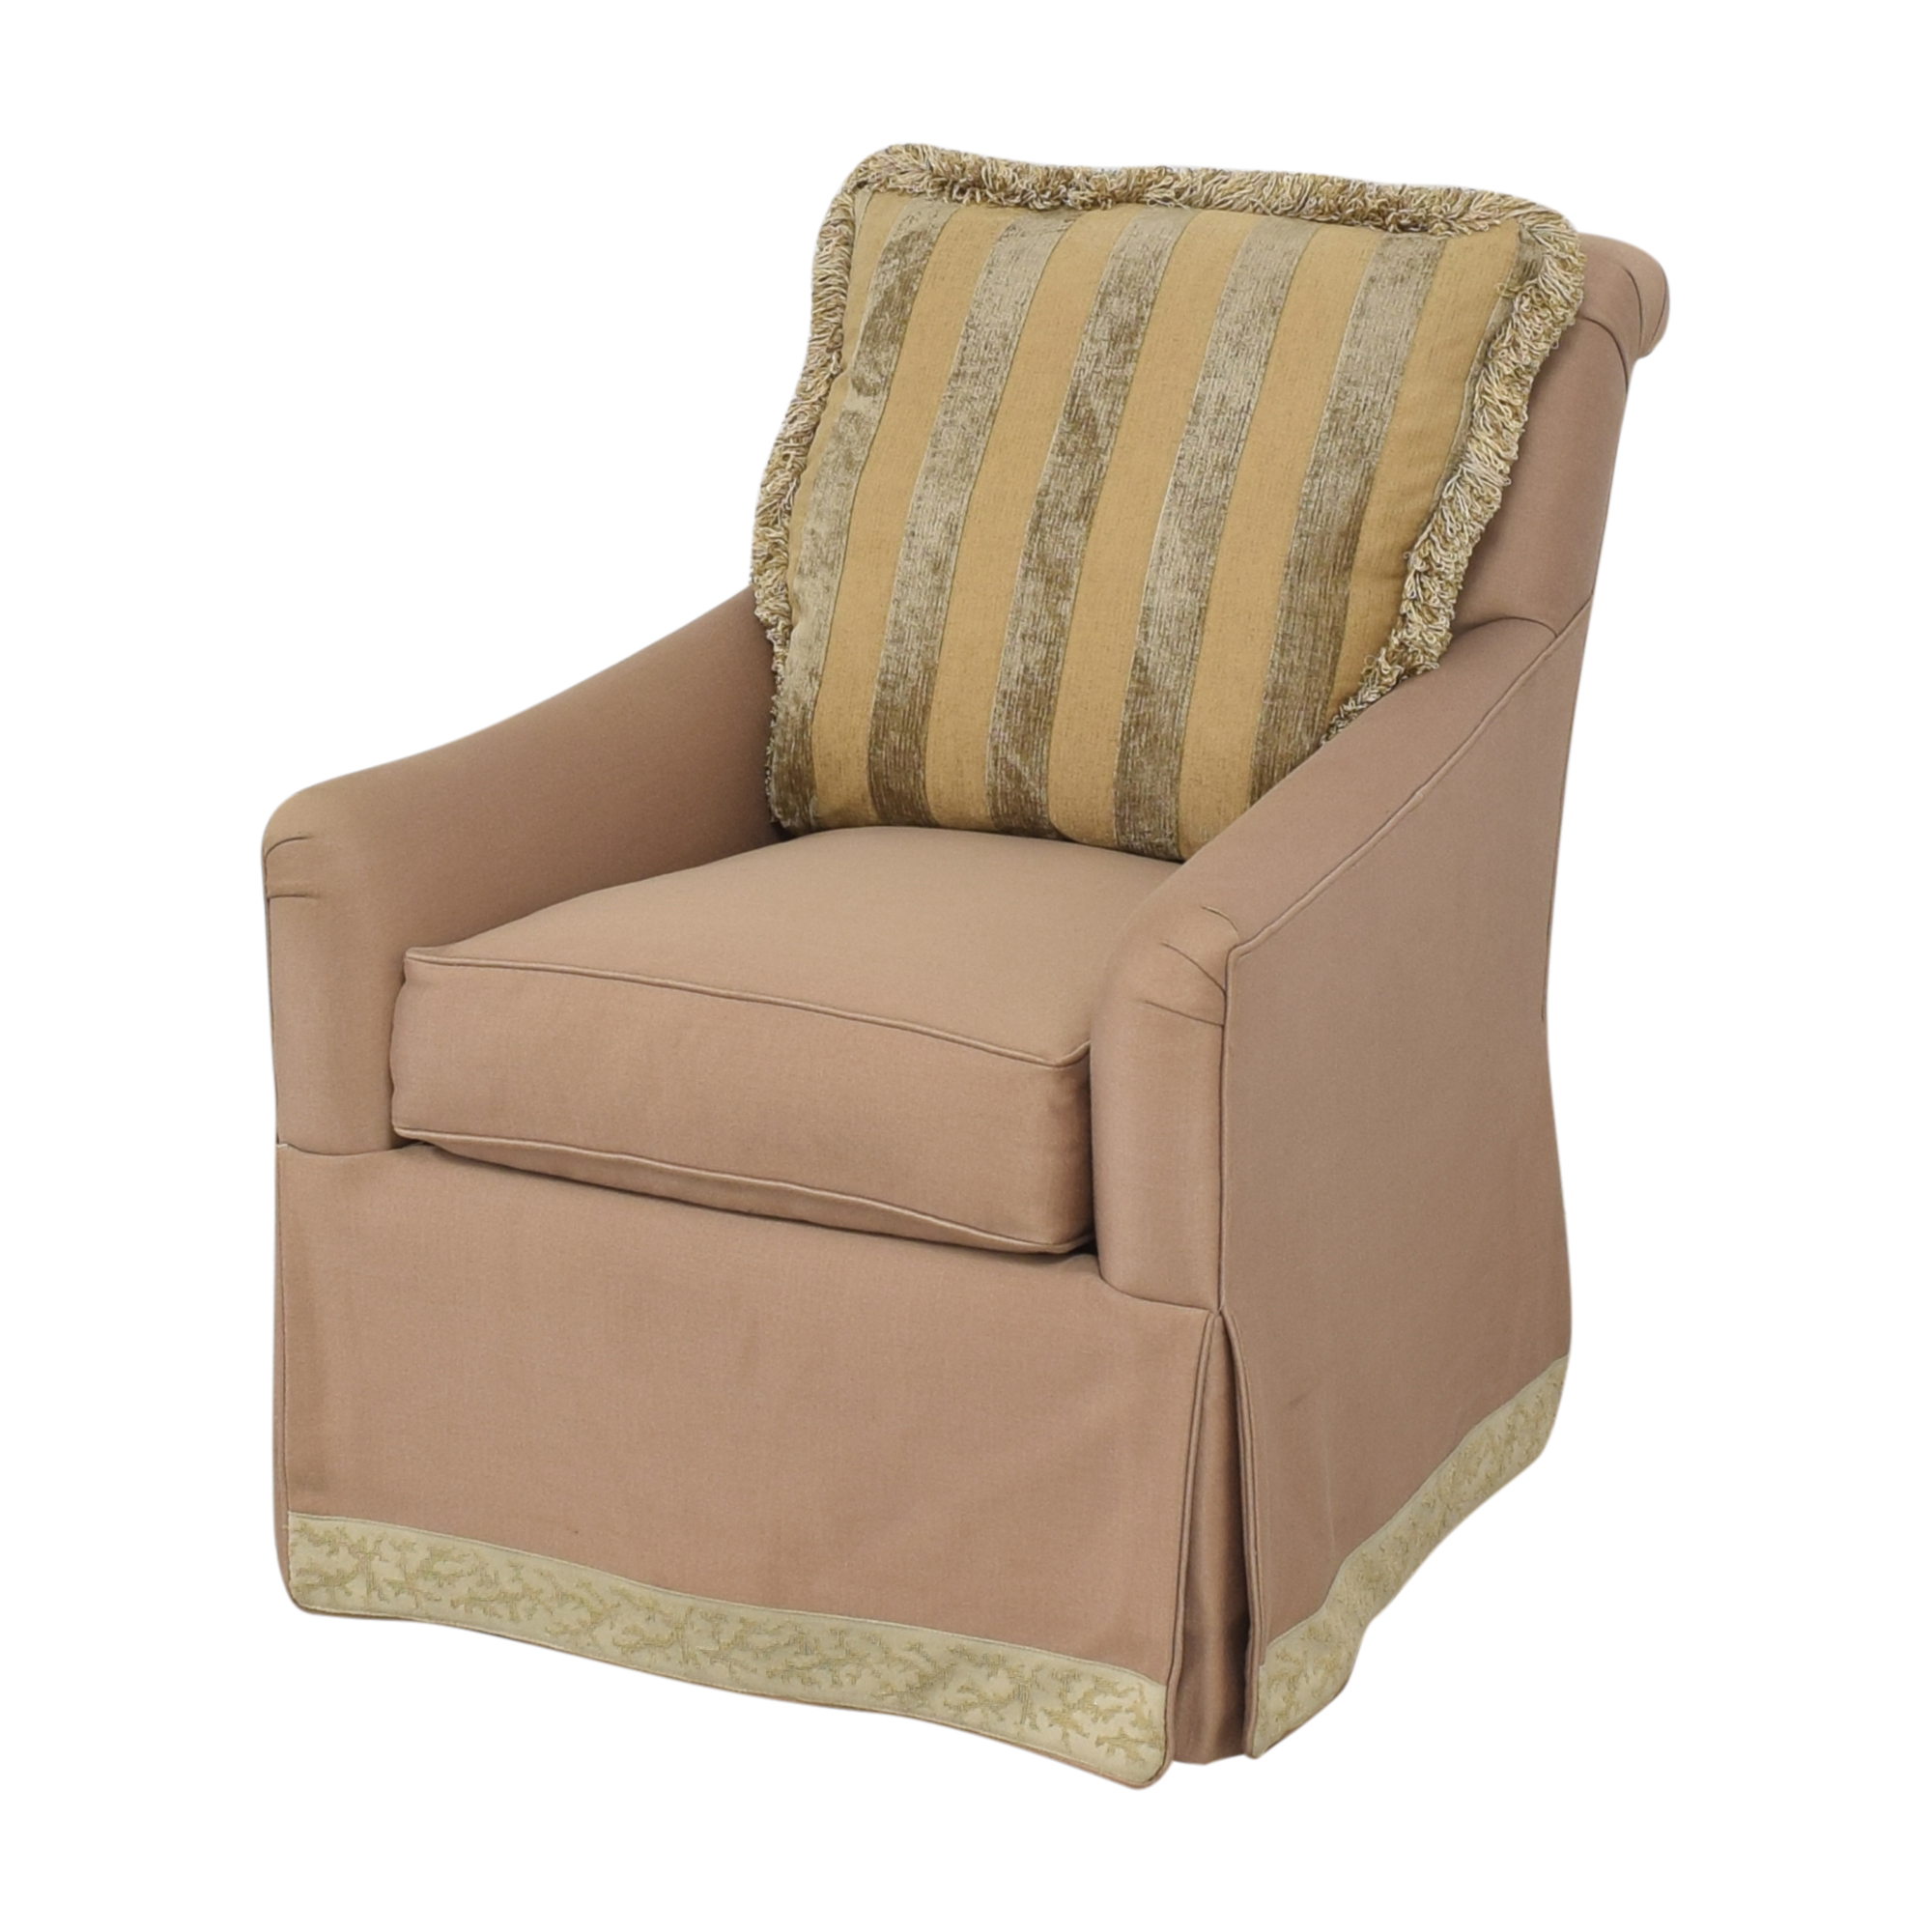 Tomlinson Tomlinson Erwin-Lambeth Upholstered Swivel Chair used